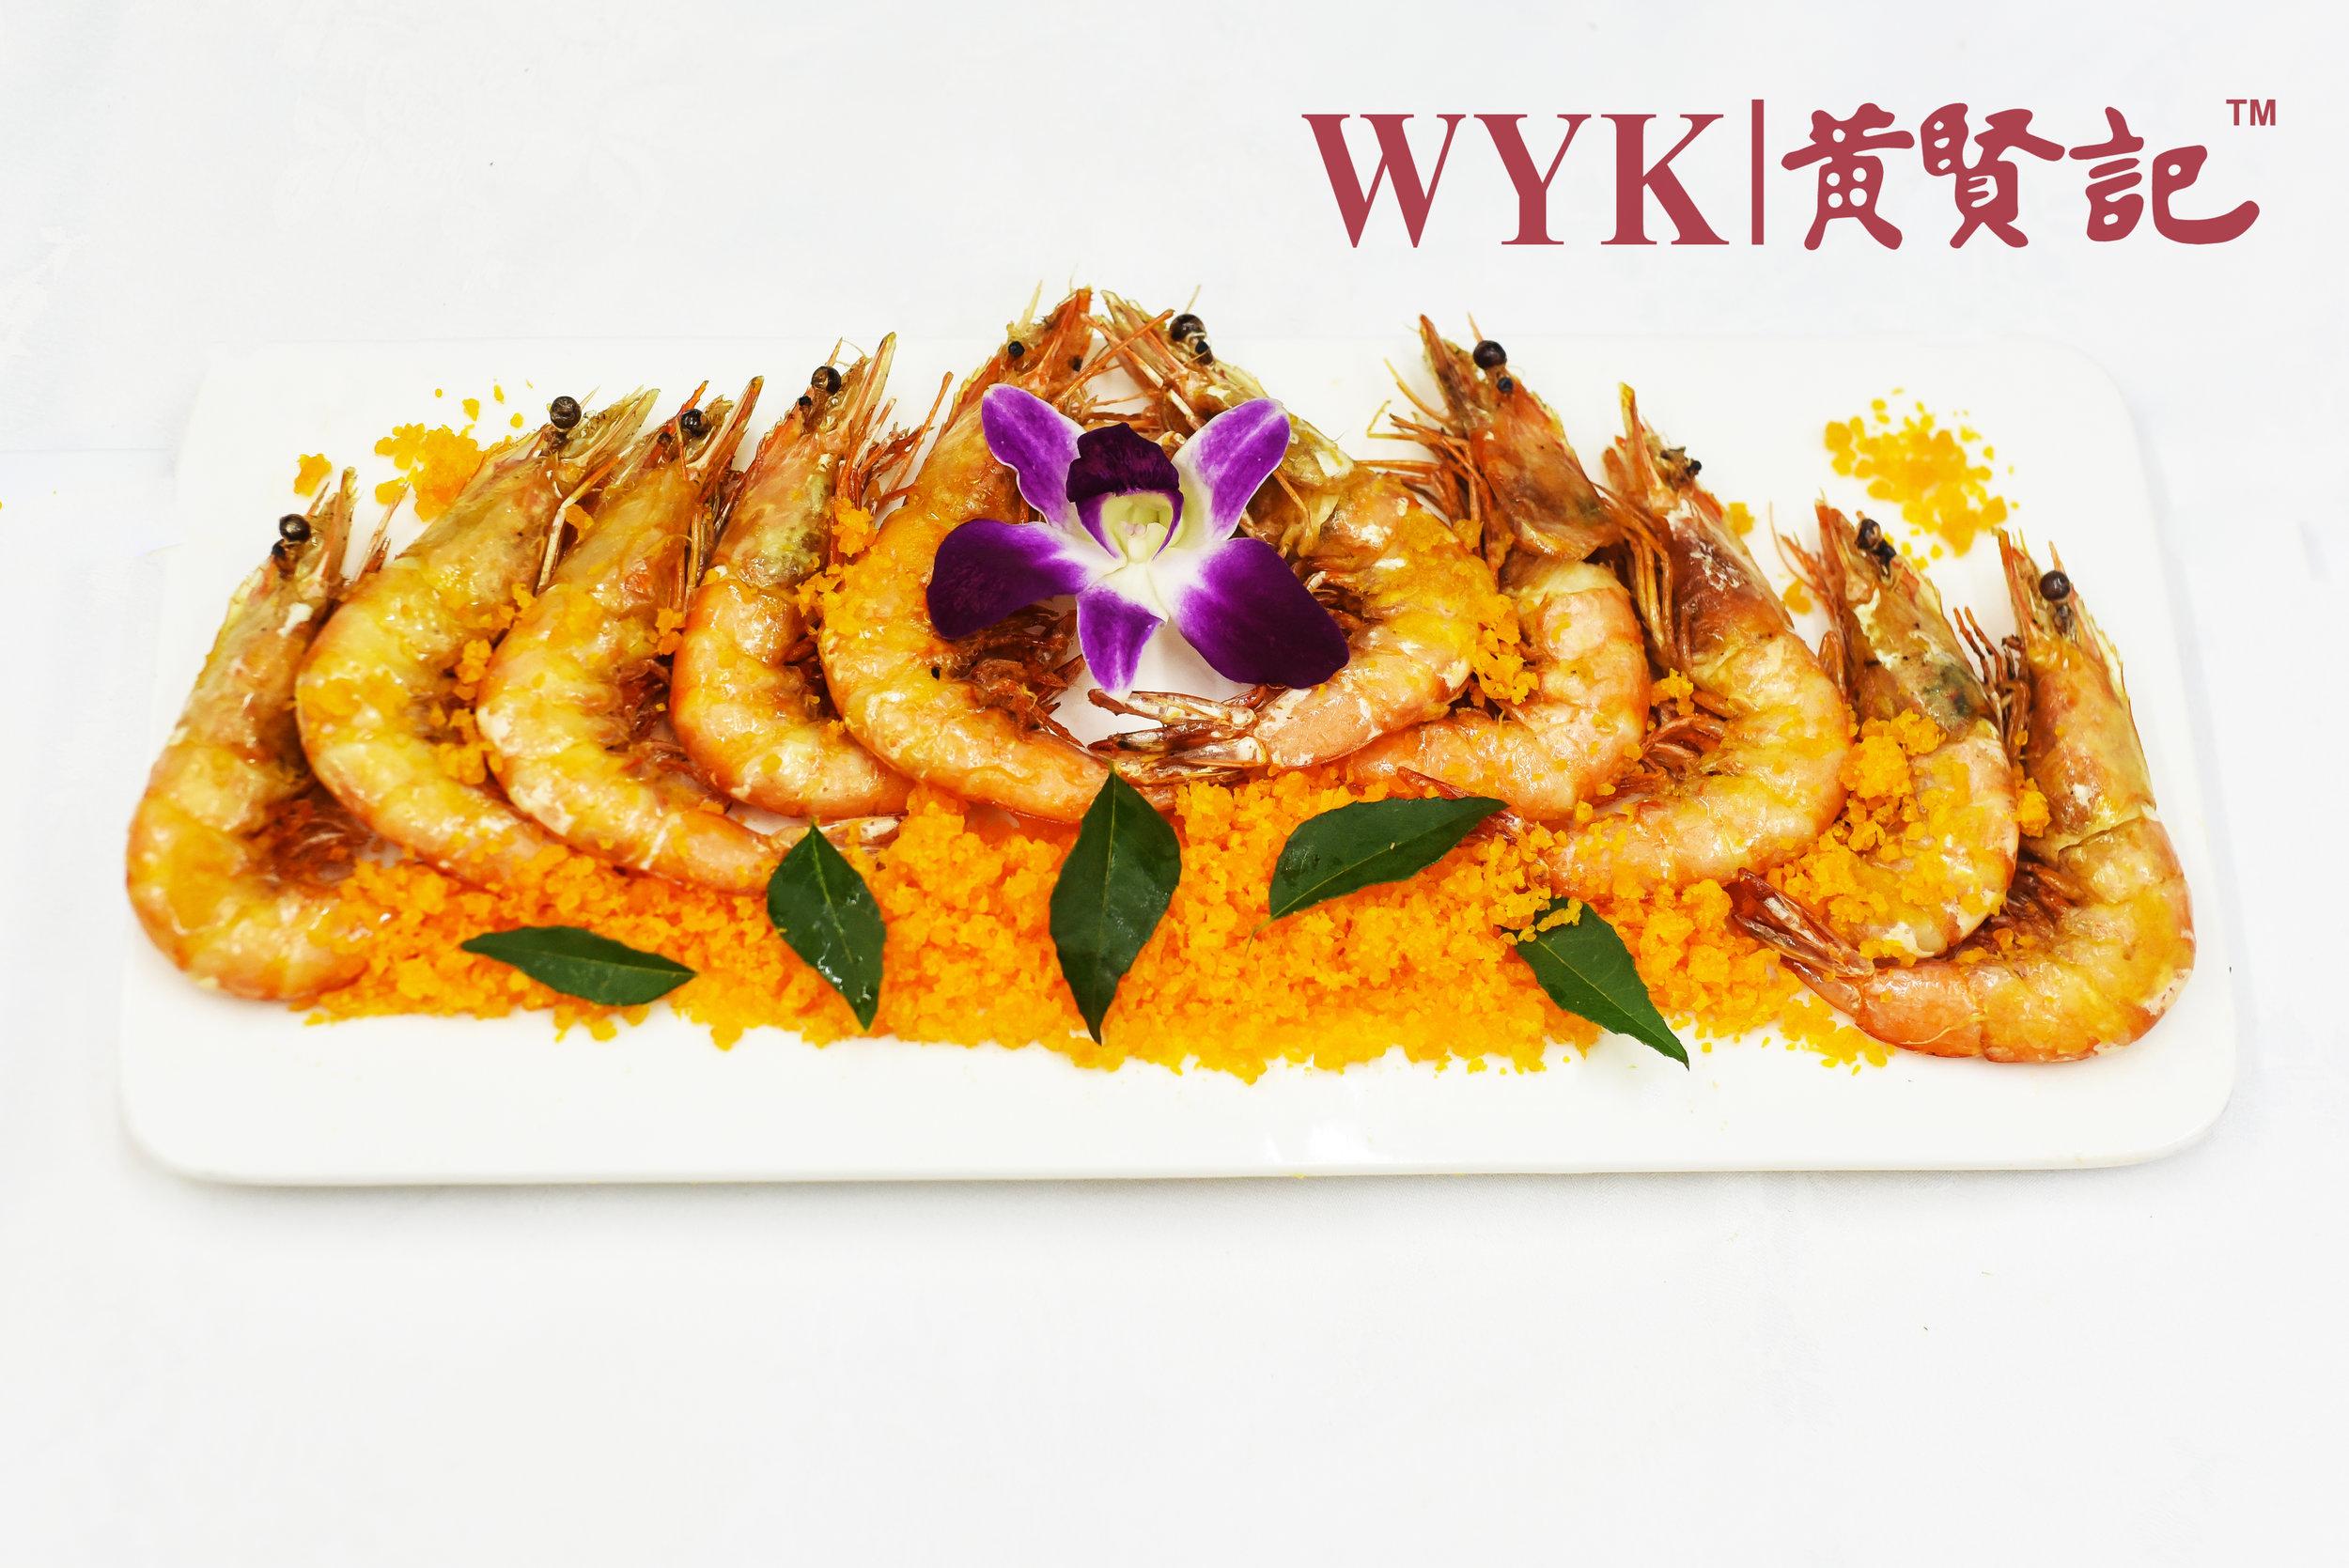 金玉满堂黄金虾 Baked White Prawns With Salted Egg Yolk.jpg